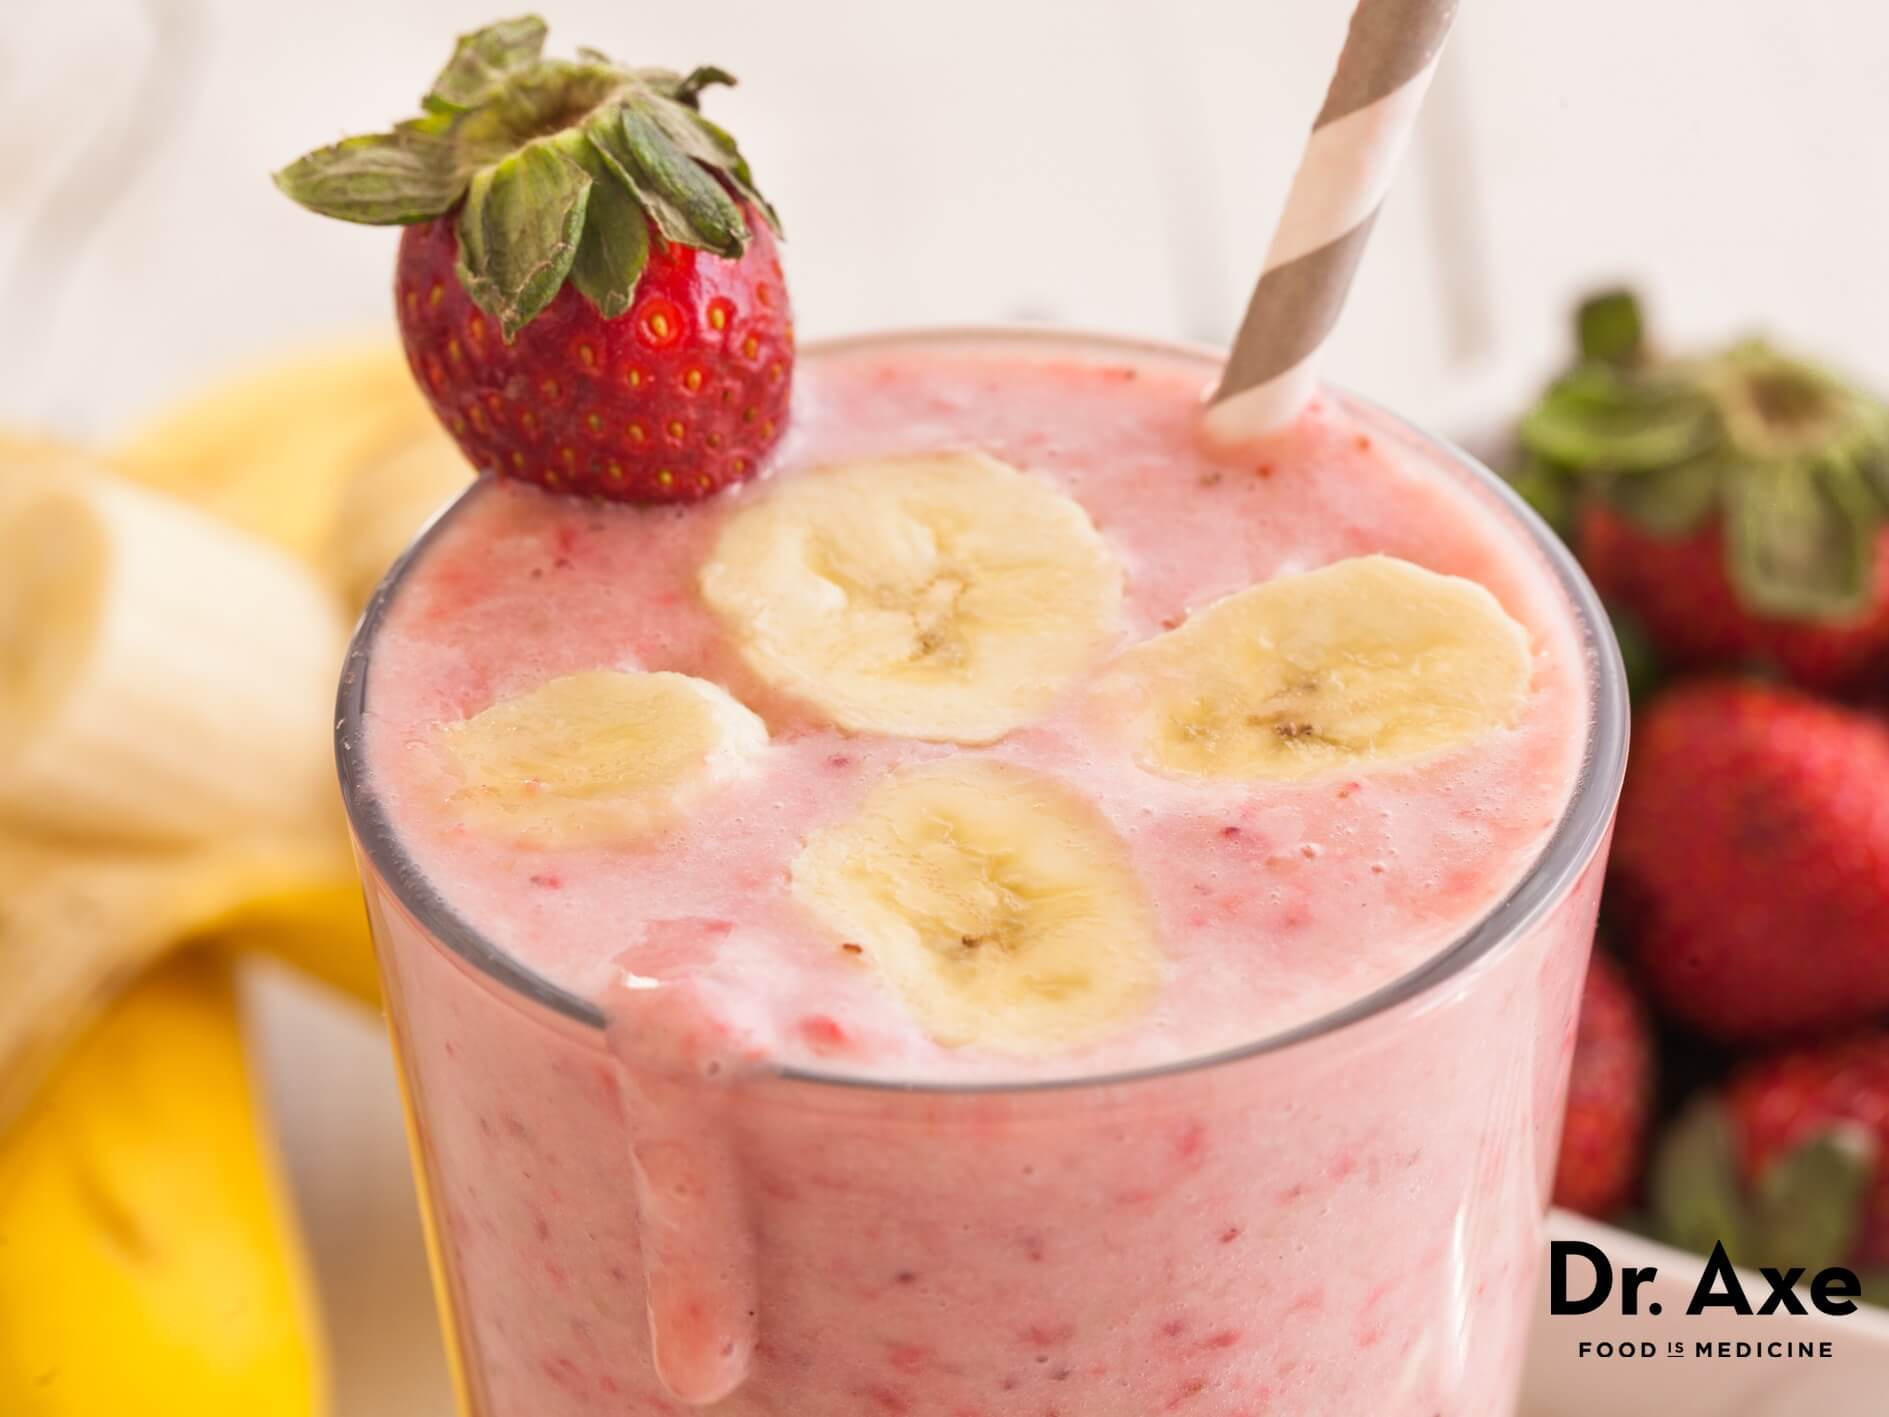 Strawberry Bananas Smoothies  Strawberry Banana Smoothie Recipe DrAxe